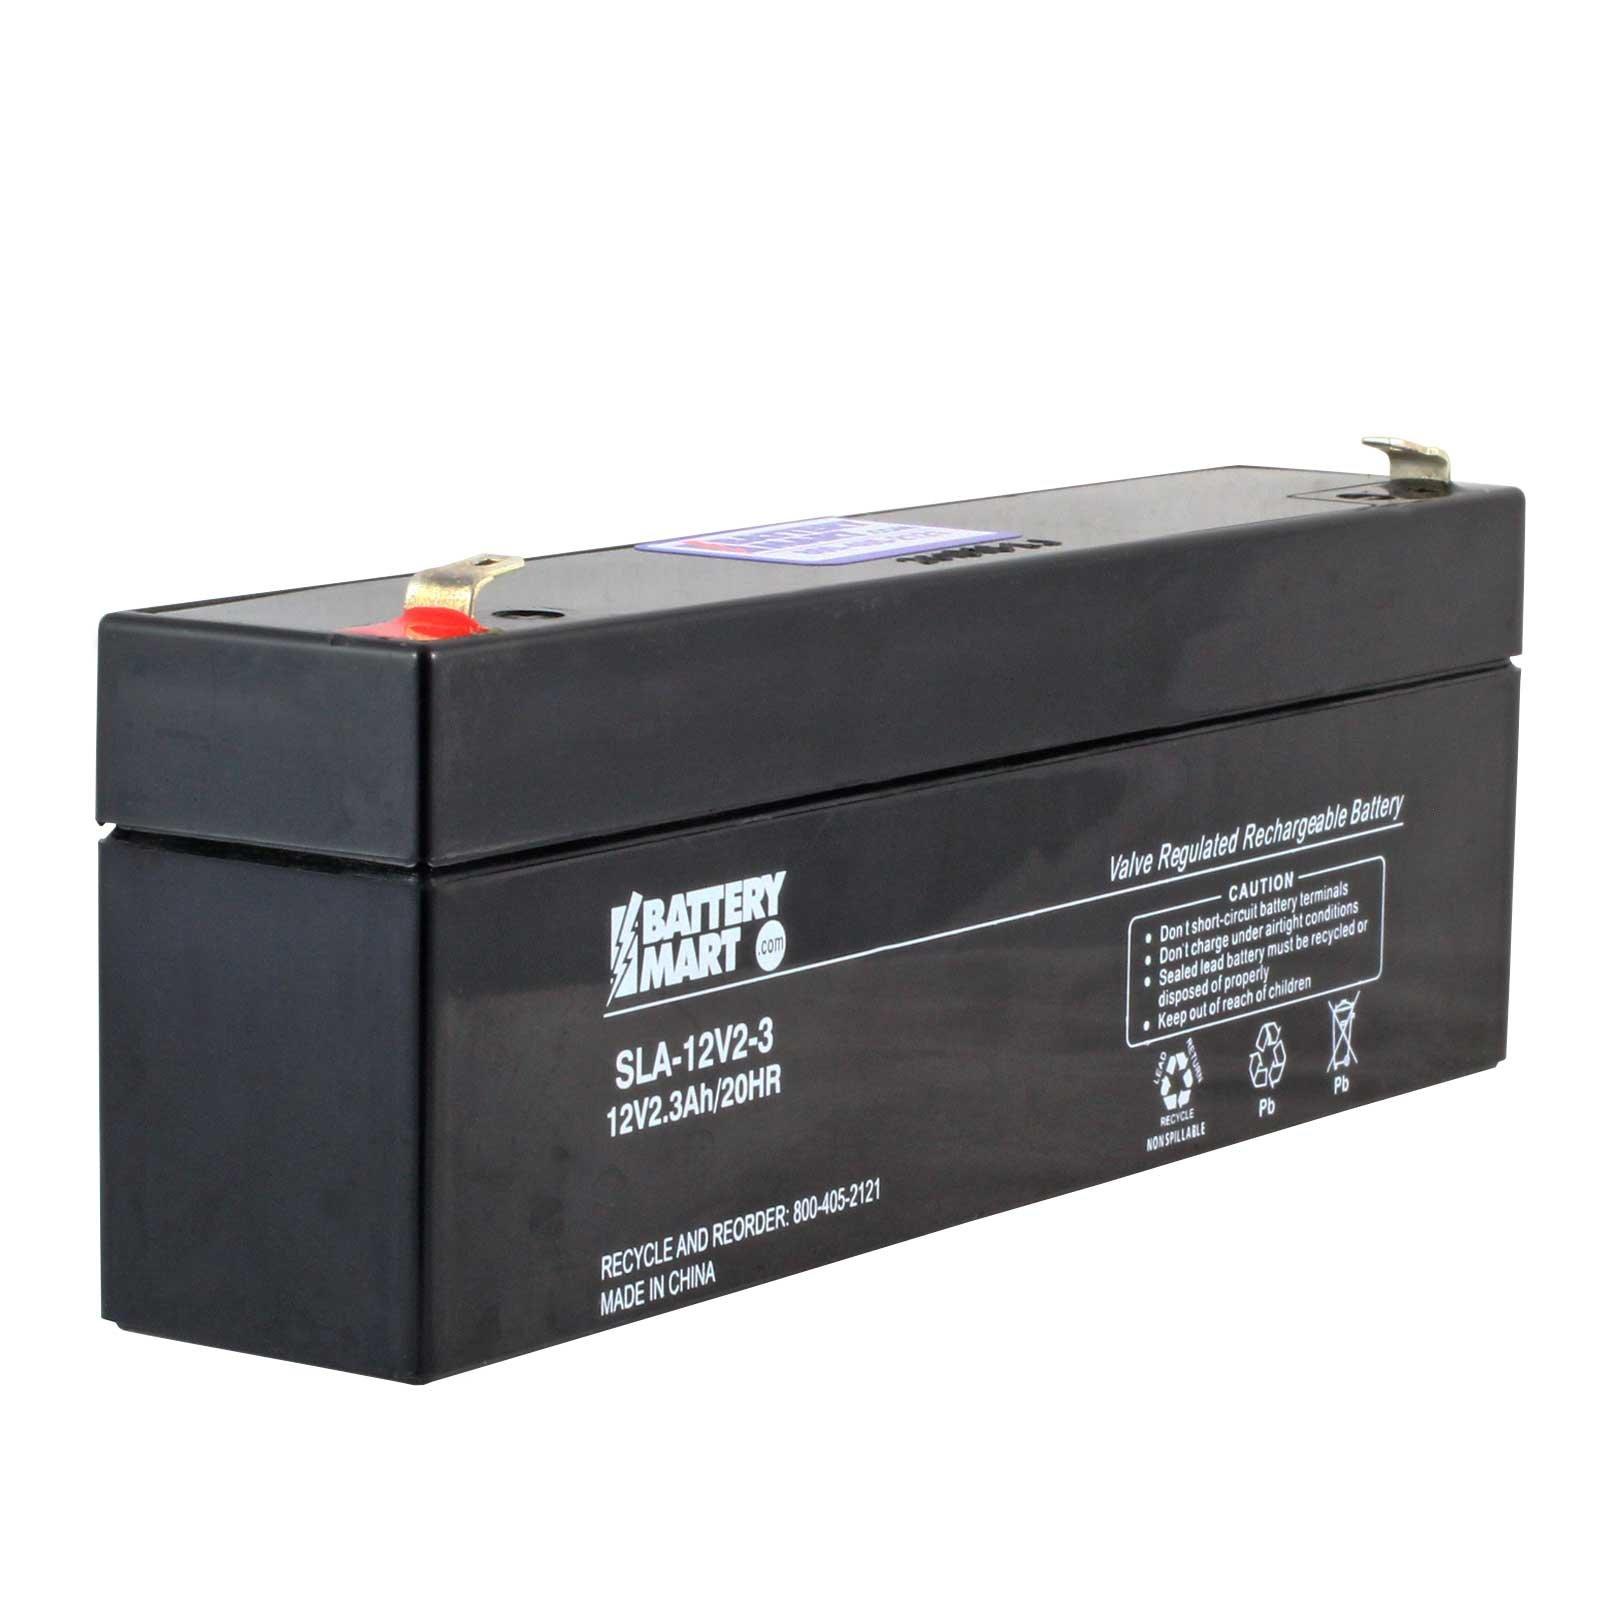 12 volt 2 2 ah sealed lead acid rechargeable battery f1 terminal. Black Bedroom Furniture Sets. Home Design Ideas